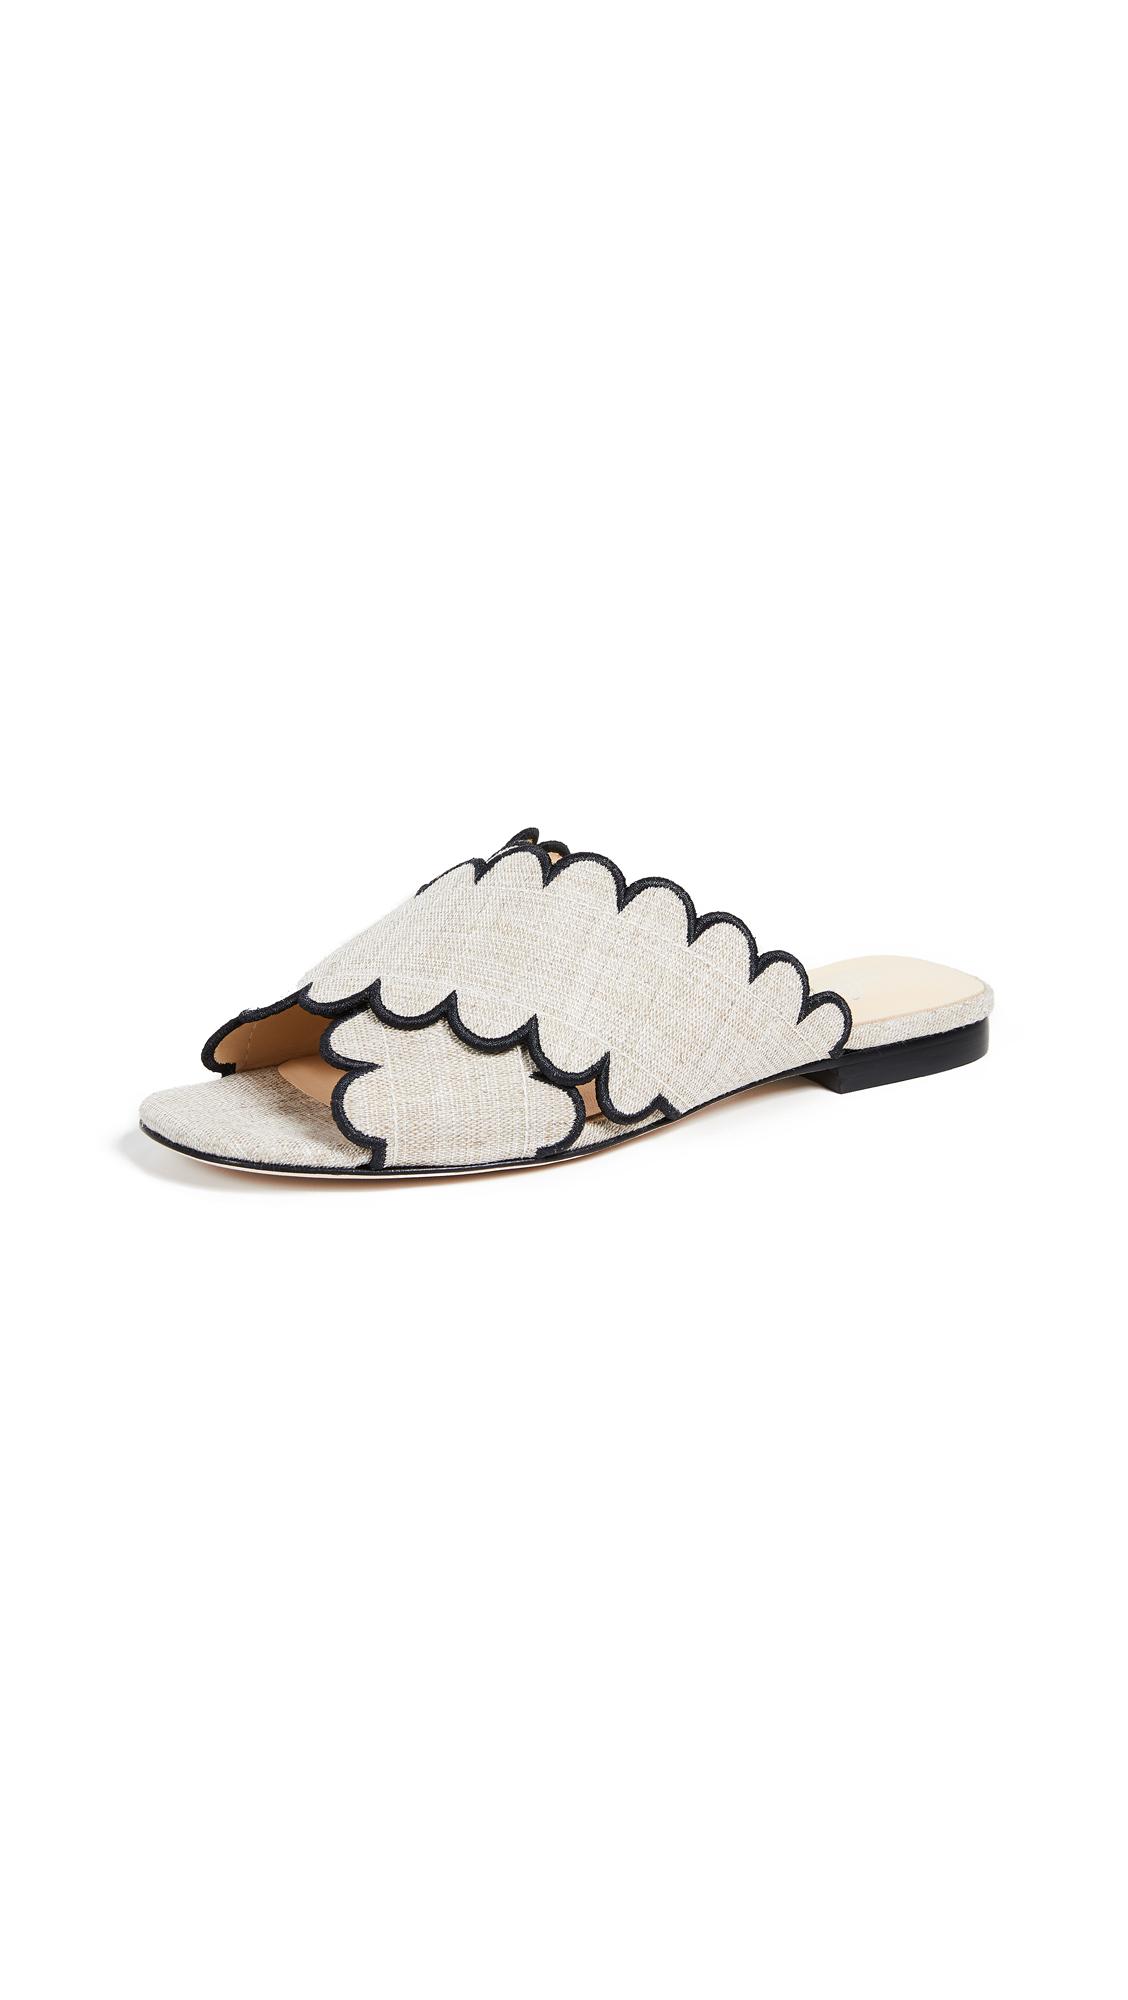 Isa Tapia Nueva Scalloped Slide Sandals - Natural